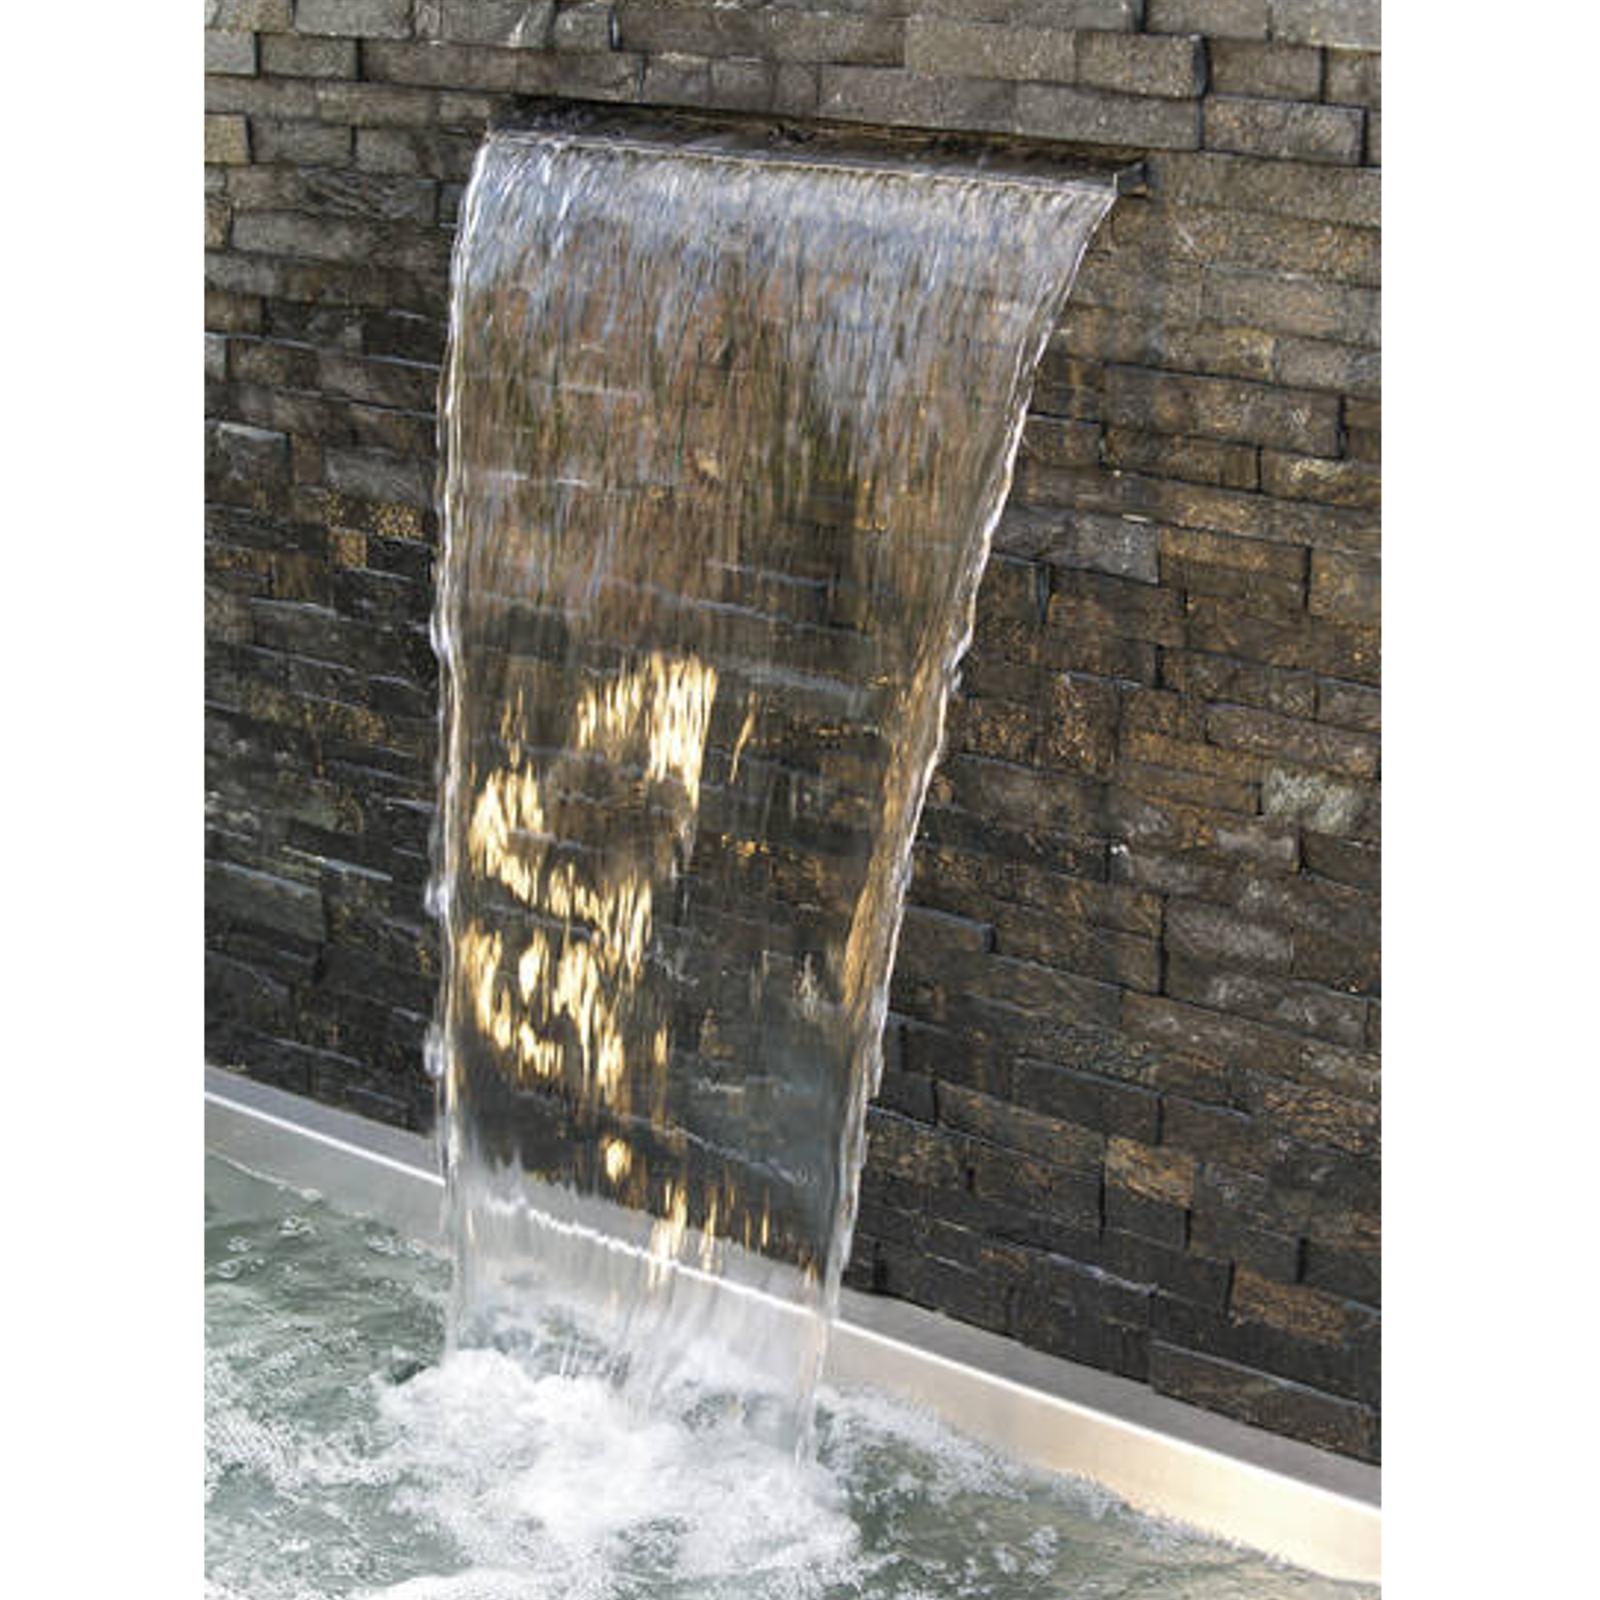 OASE POND WATERFALL BLADE 60 GARDEN CASCADE WATER FEATURE ILLUMINATION LED LIGHT